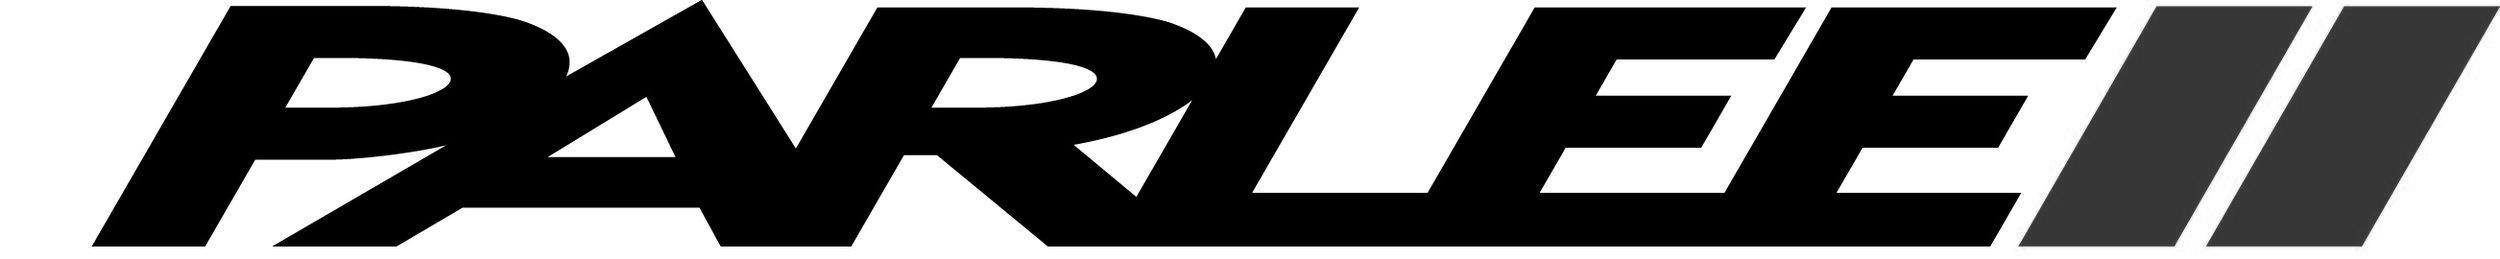 Parlee-Logo.jpg